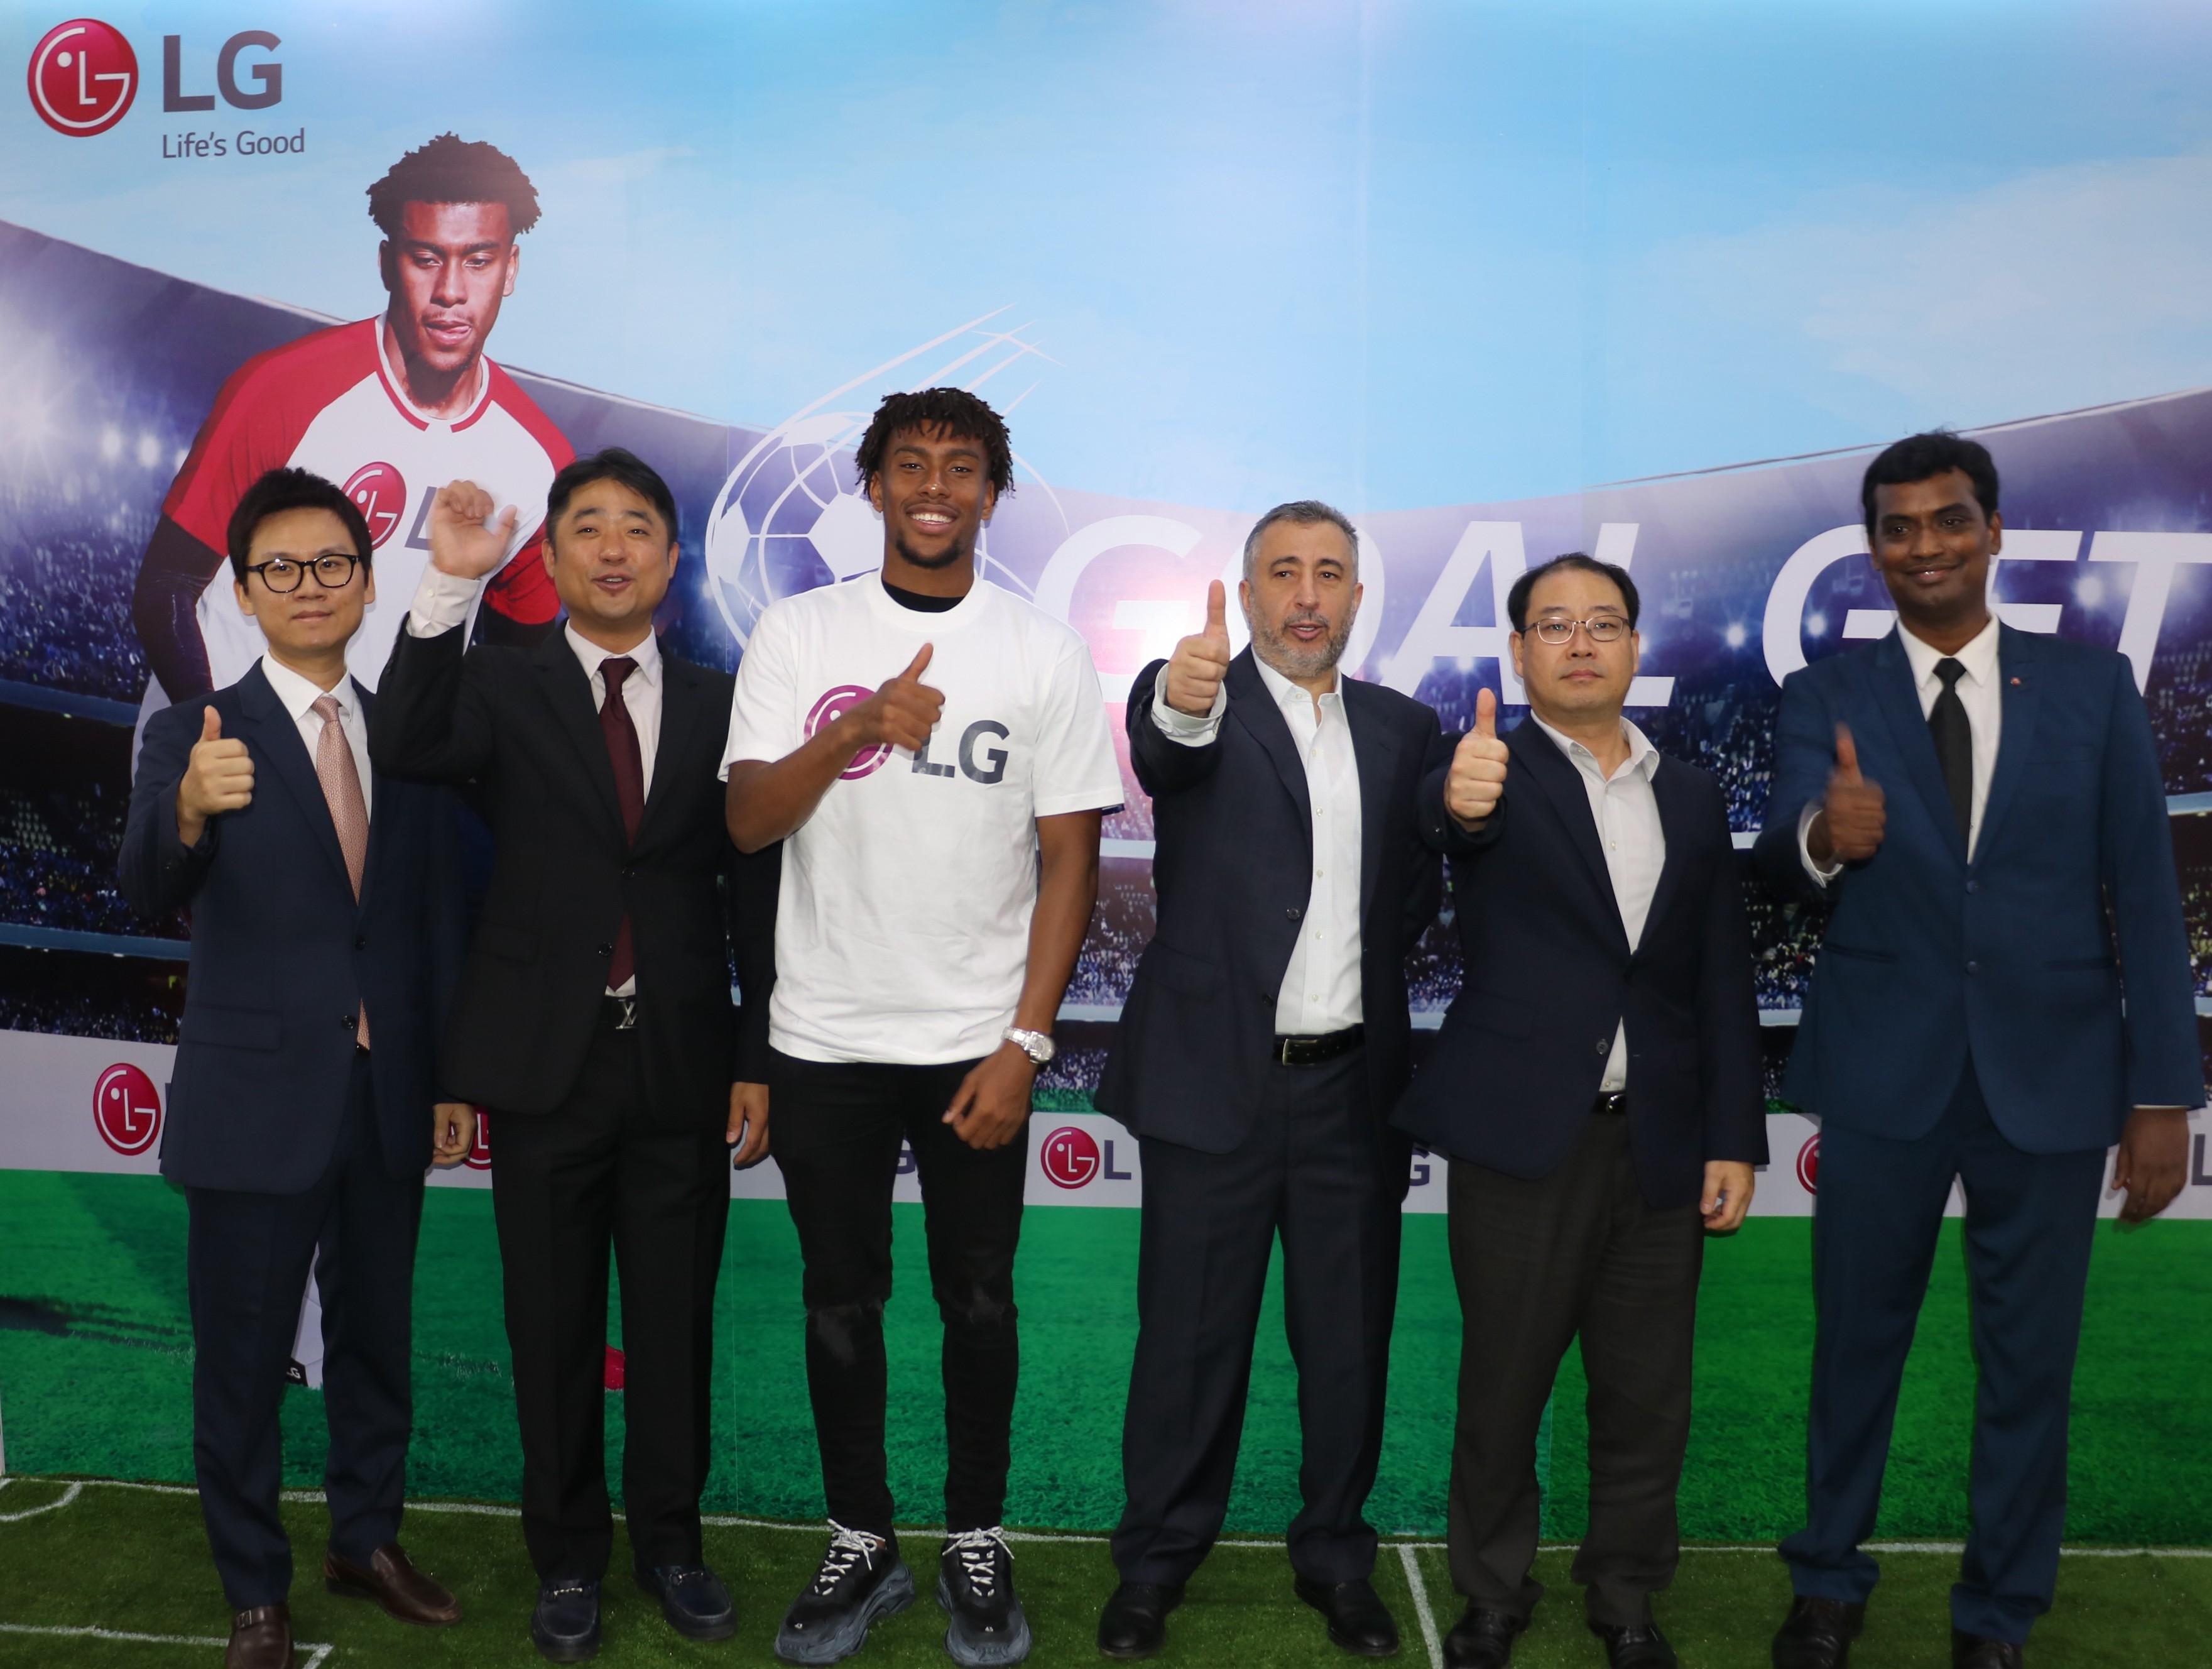 LG Electronics signs international football player, Alex Iwobi as brand ambassador